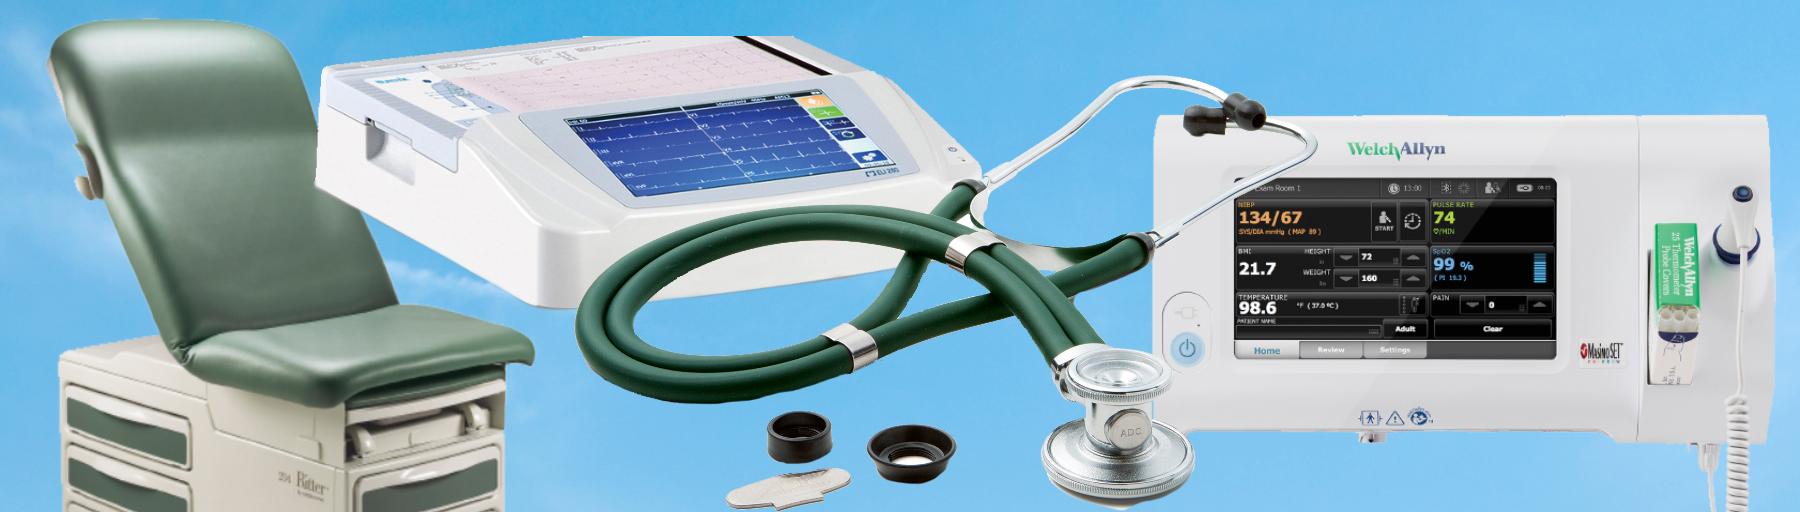 6c9f01211fef62 Aesthetics Equipment - Henry Schein Medical